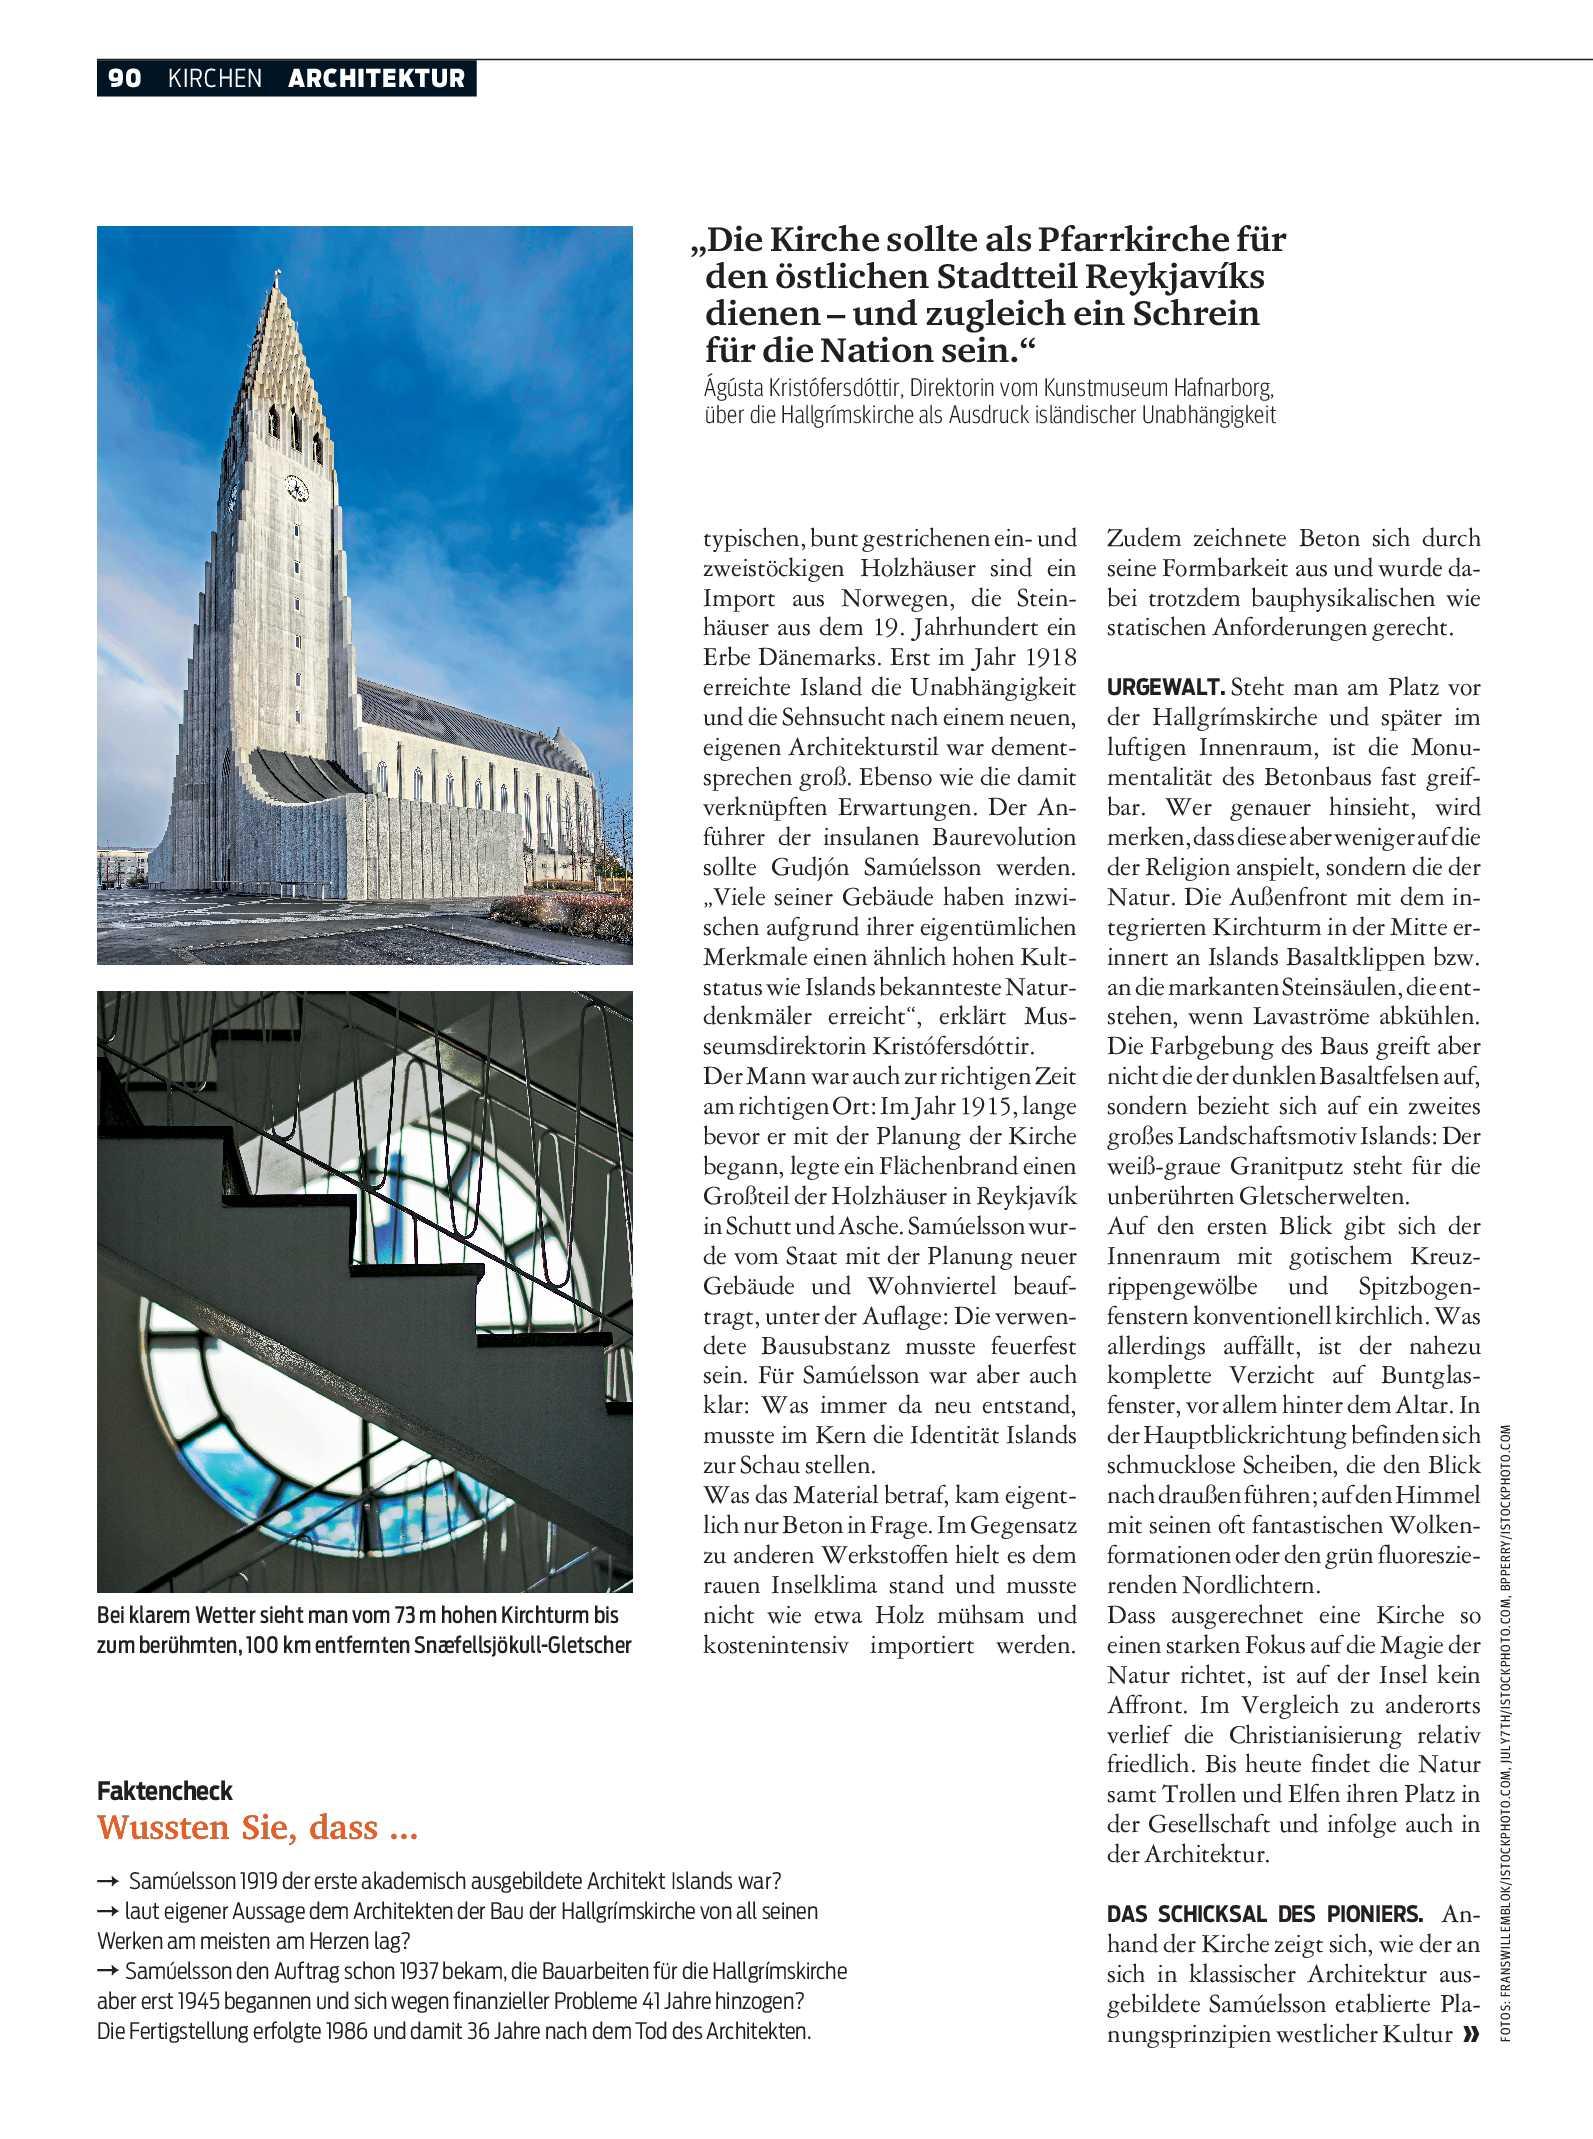 public/epaper/imported/20200930/kurier/magazin/magazin_20200930_090.jpg